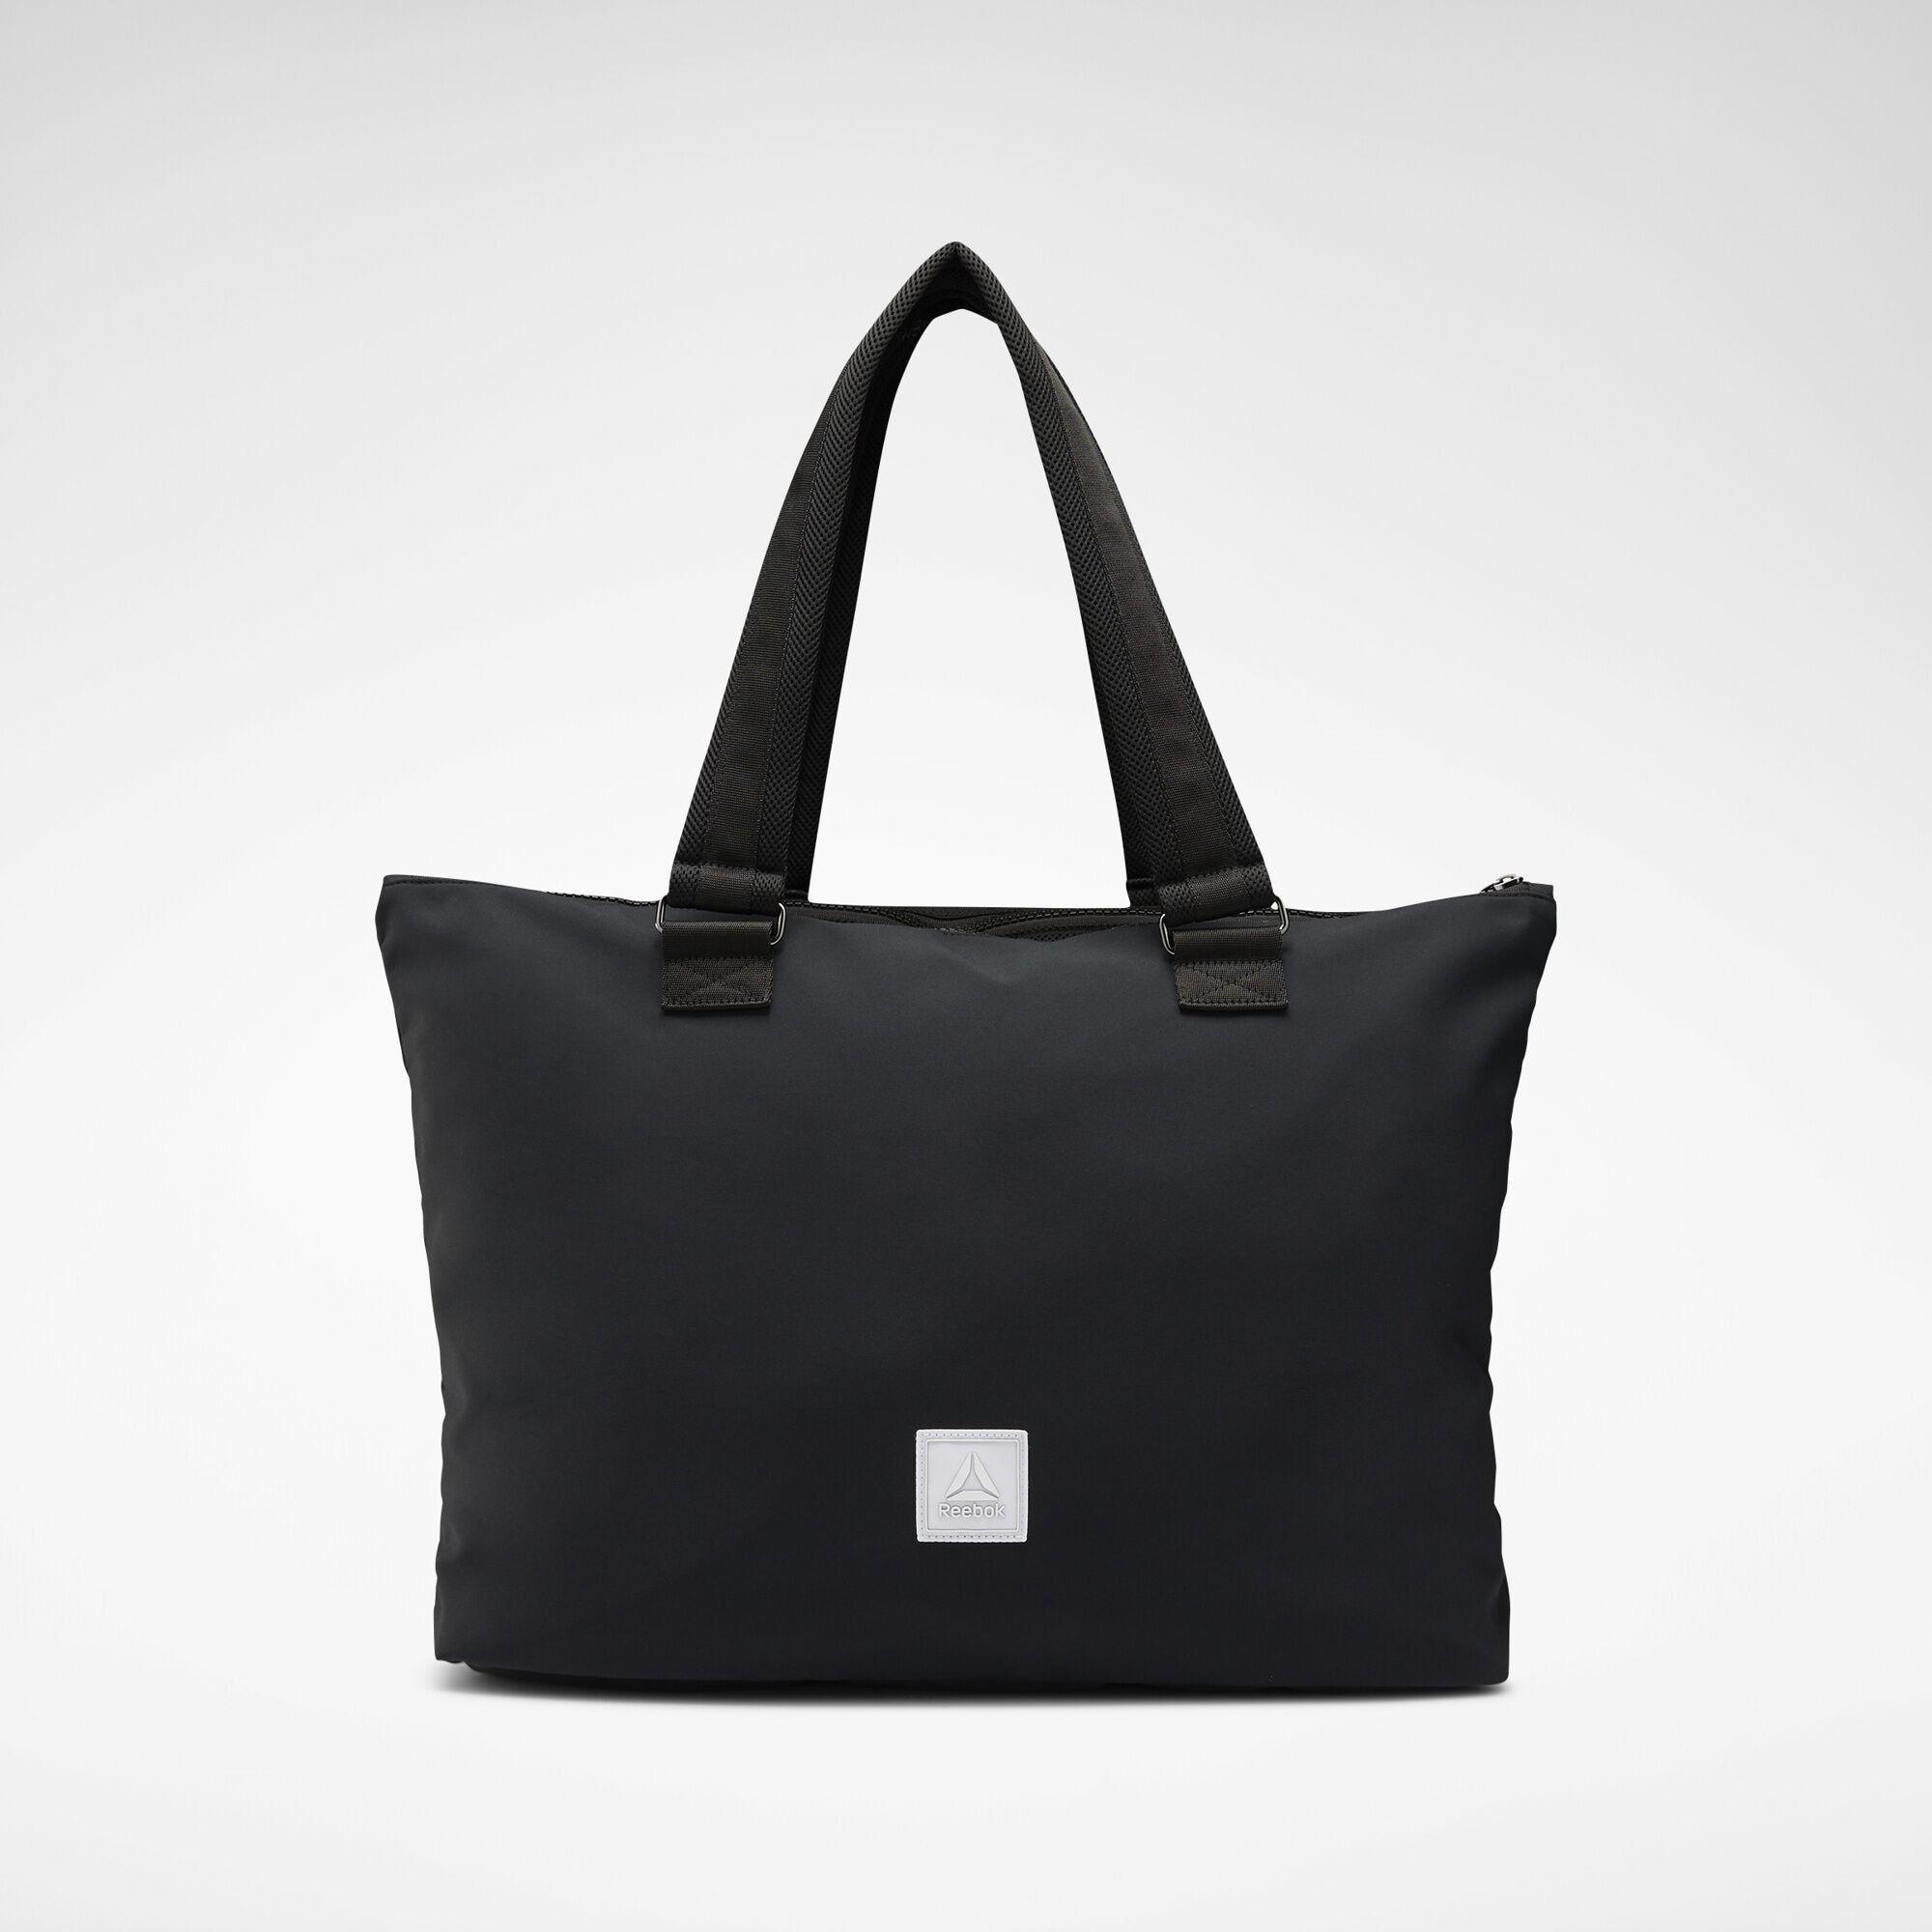 Tasche ´Training Supply Pinnacle´